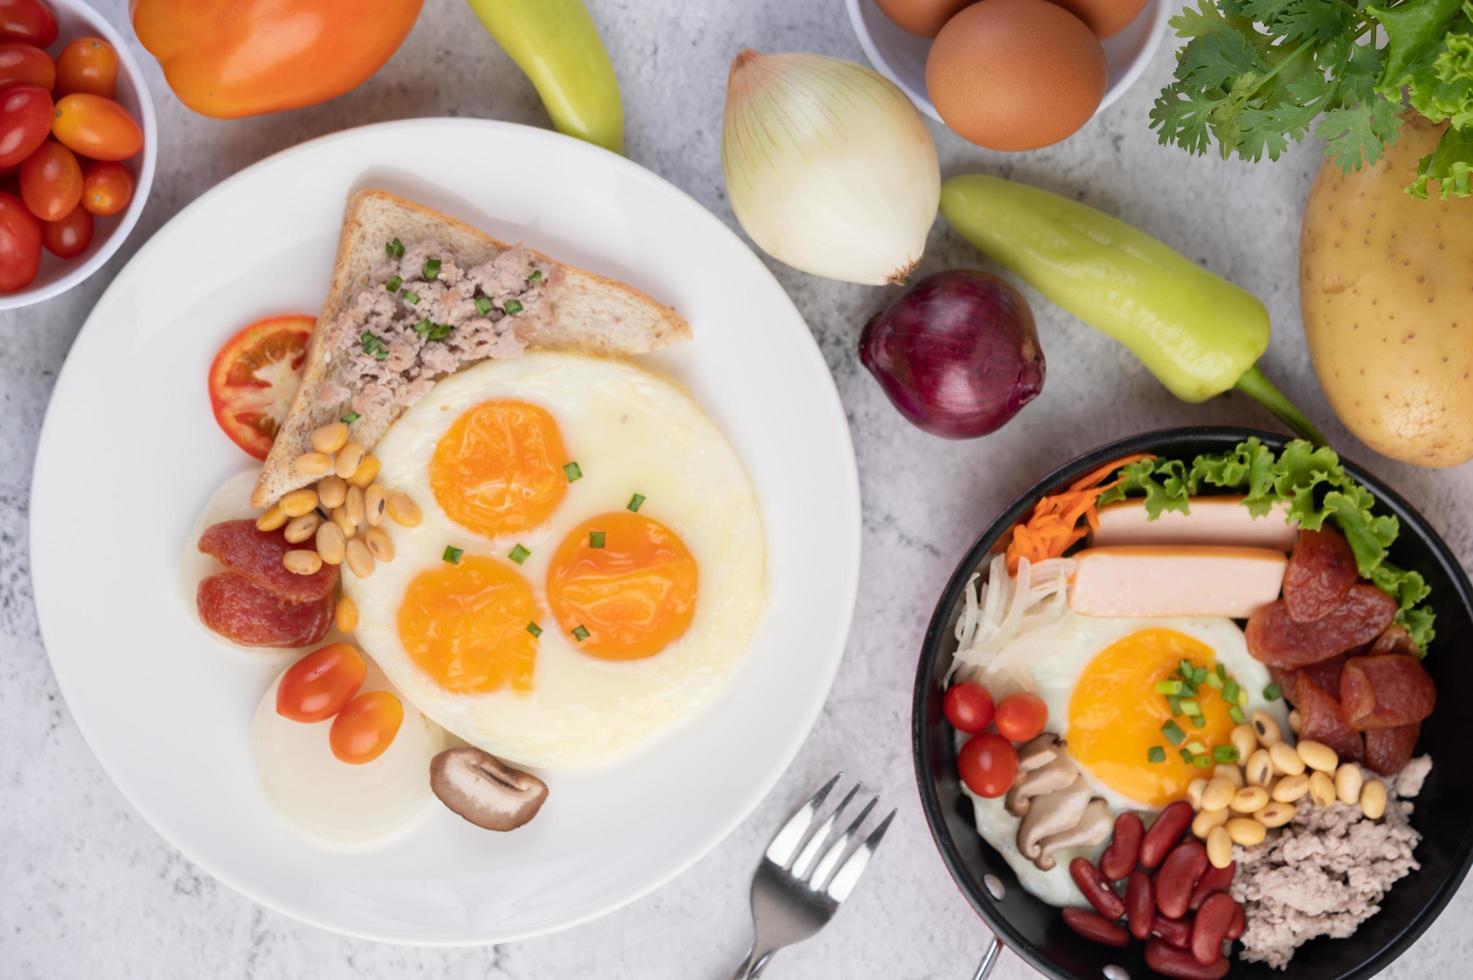 uova fritte, salsiccia, carne di maiale tritata, pane e fagioli rossi foto